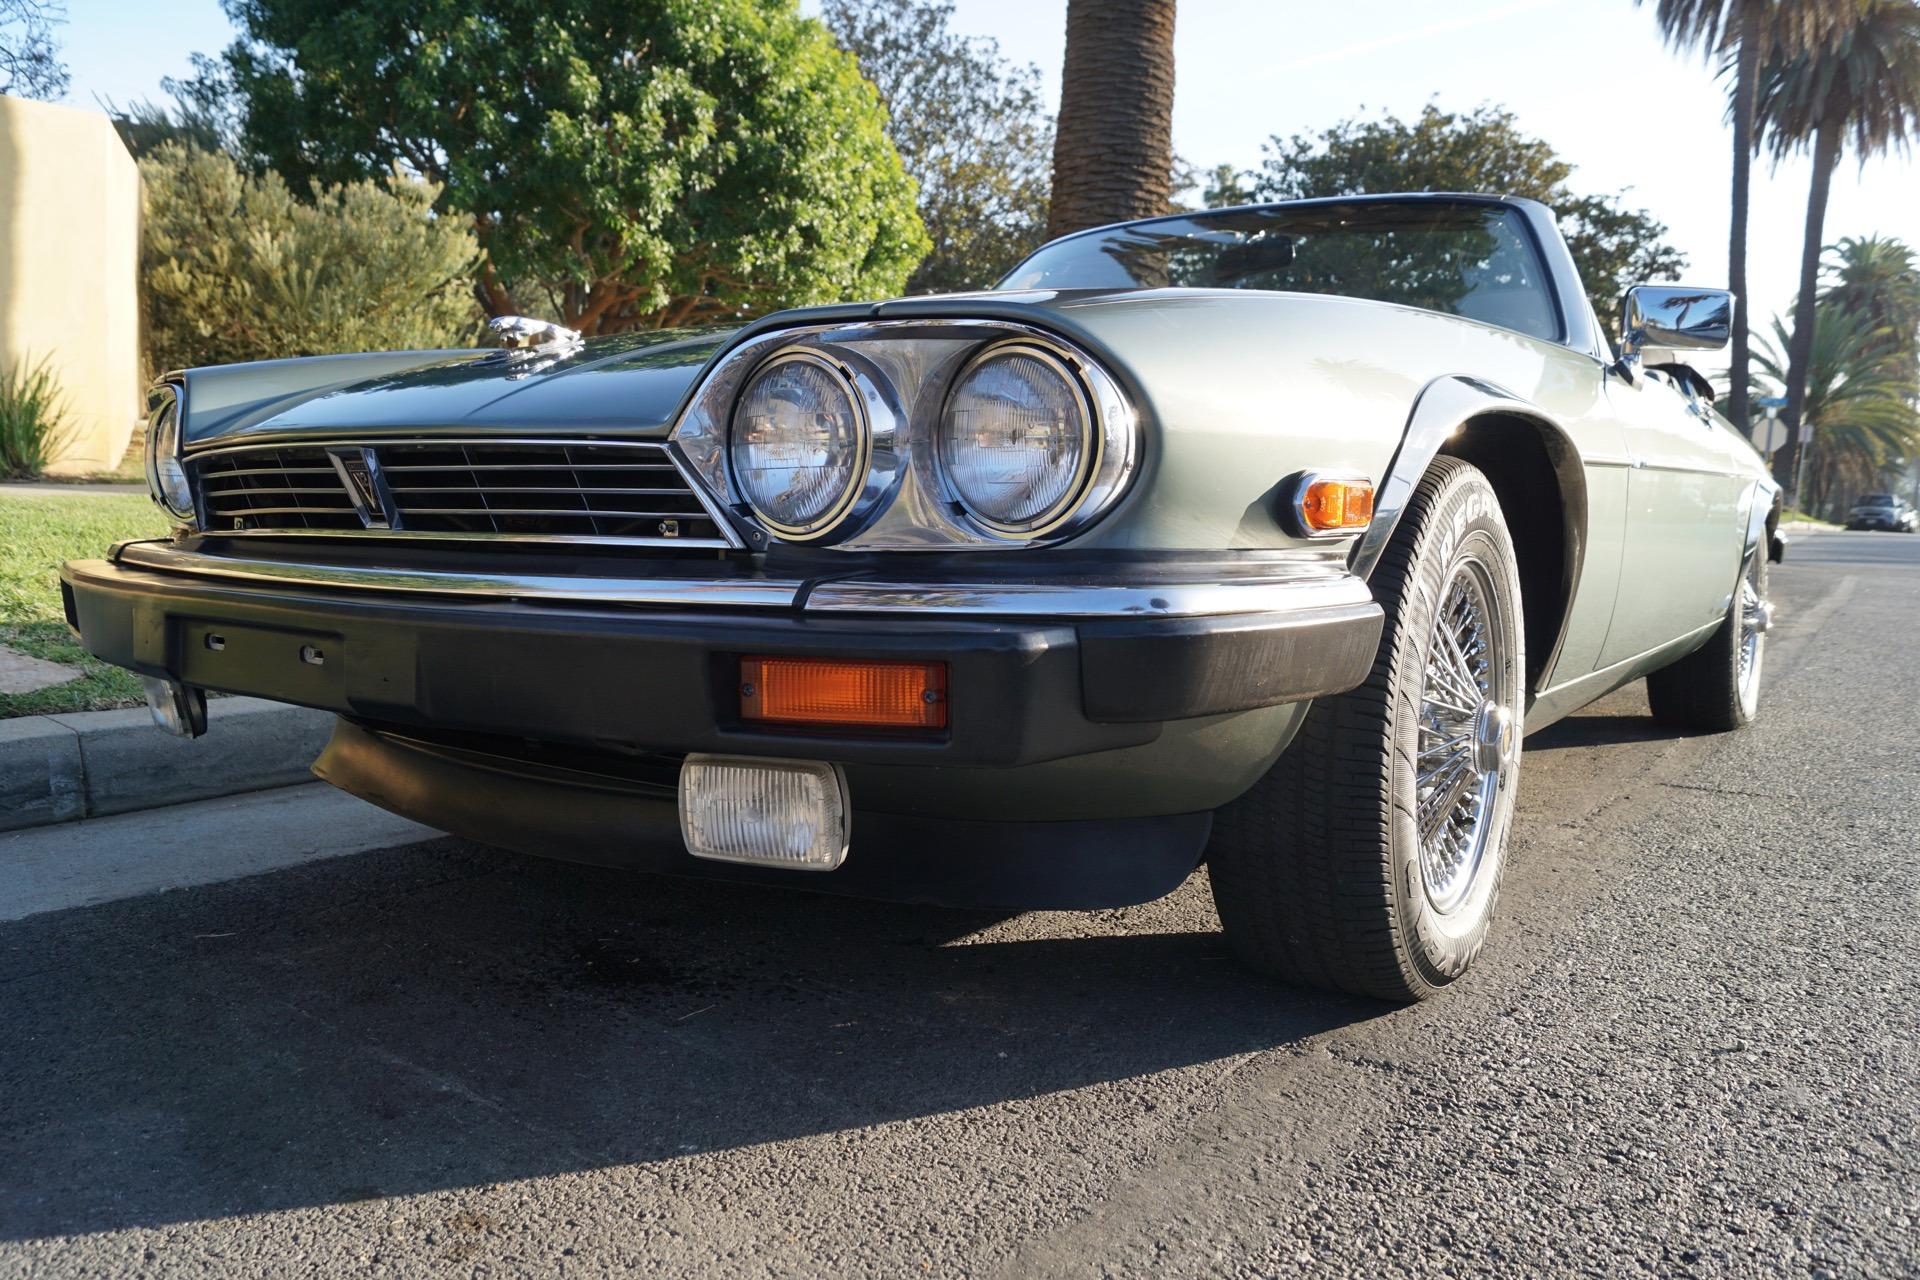 htm used sale convertible york jaguar stock ny new for c mc near